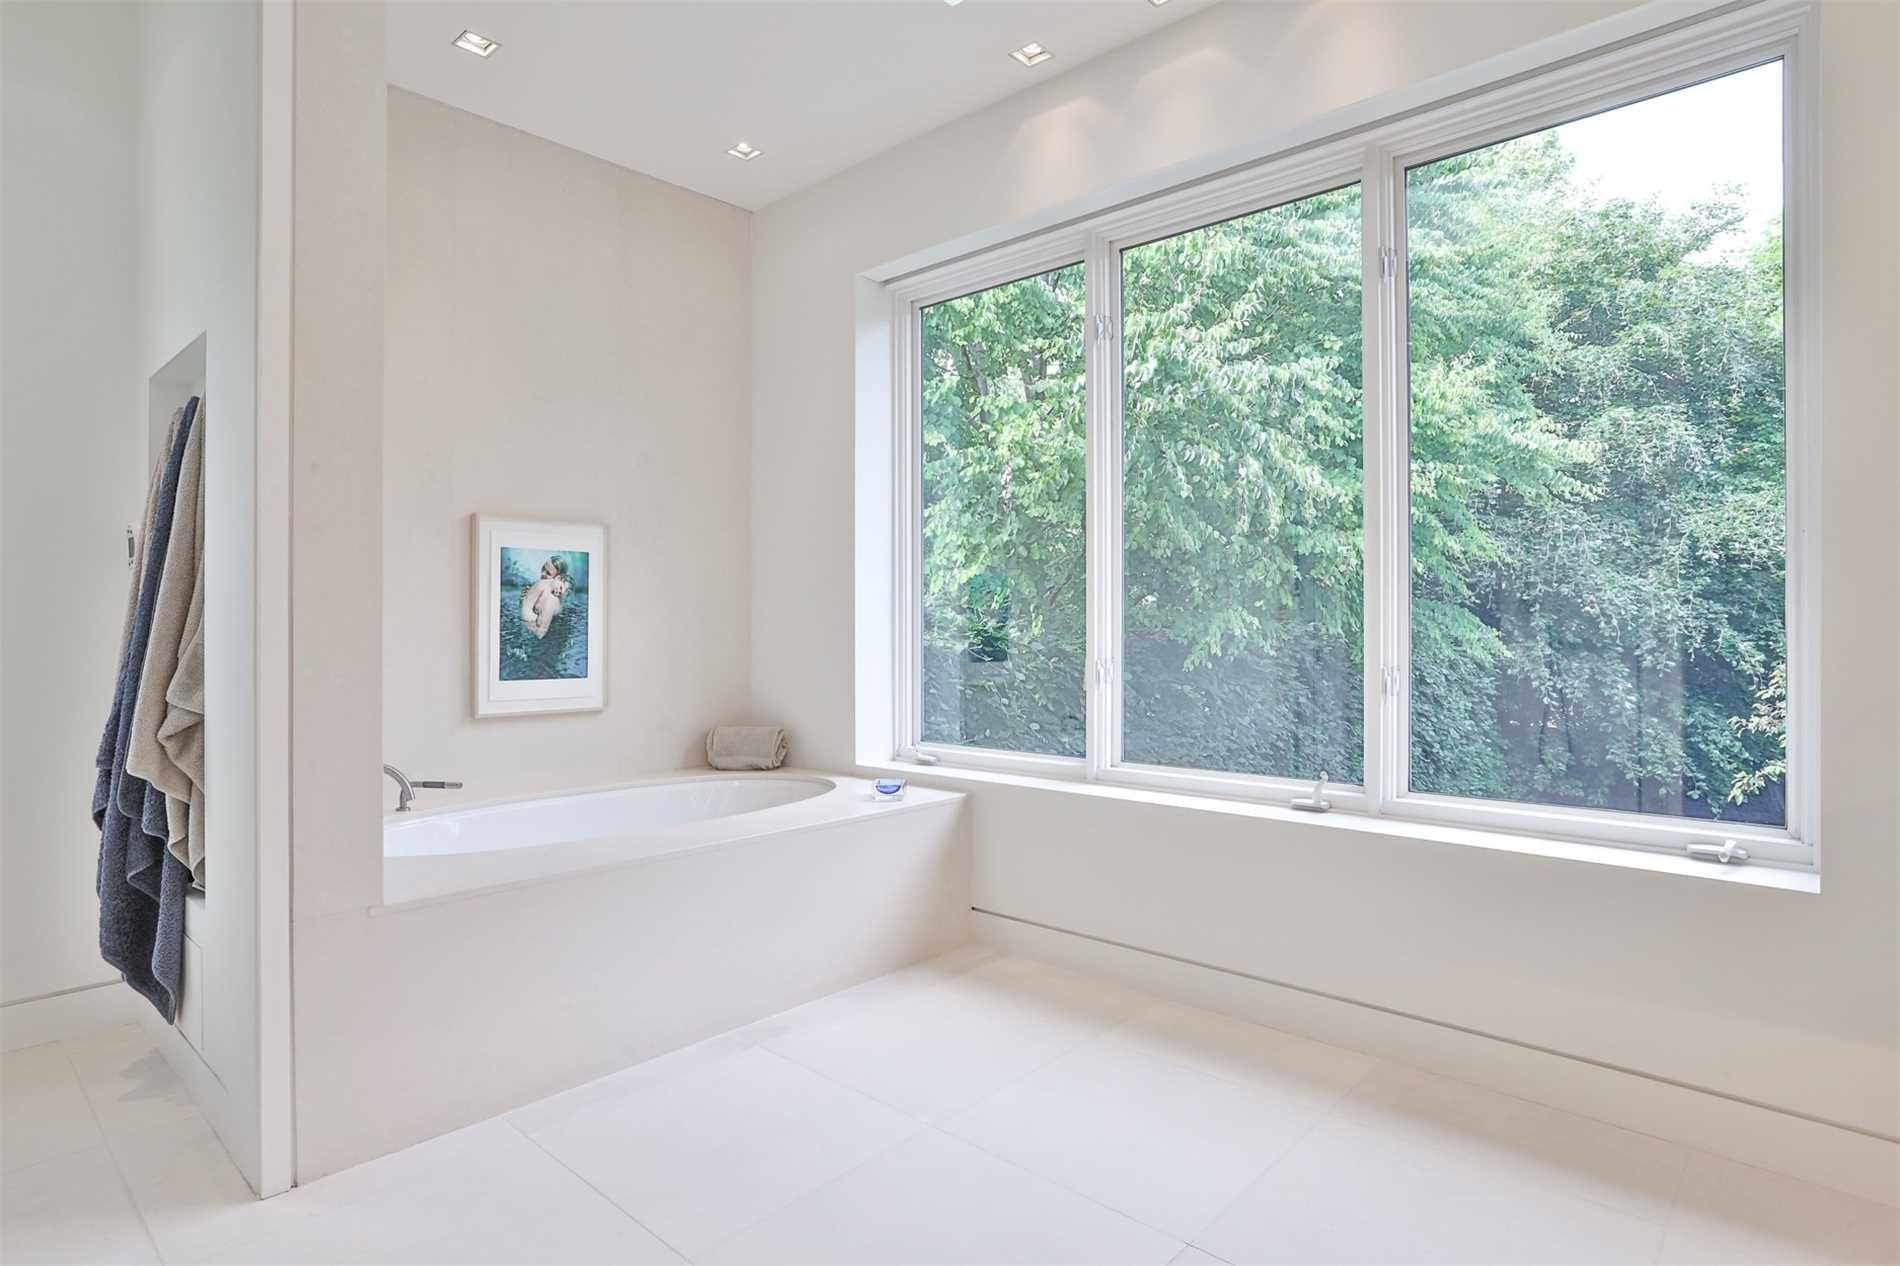 7 Cluny Dr, Toronto, Ontario M4W2P8, 5 Bedrooms Bedrooms, 9 Rooms Rooms,6 BathroomsBathrooms,Detached,For Sale,Cluny,C5264607